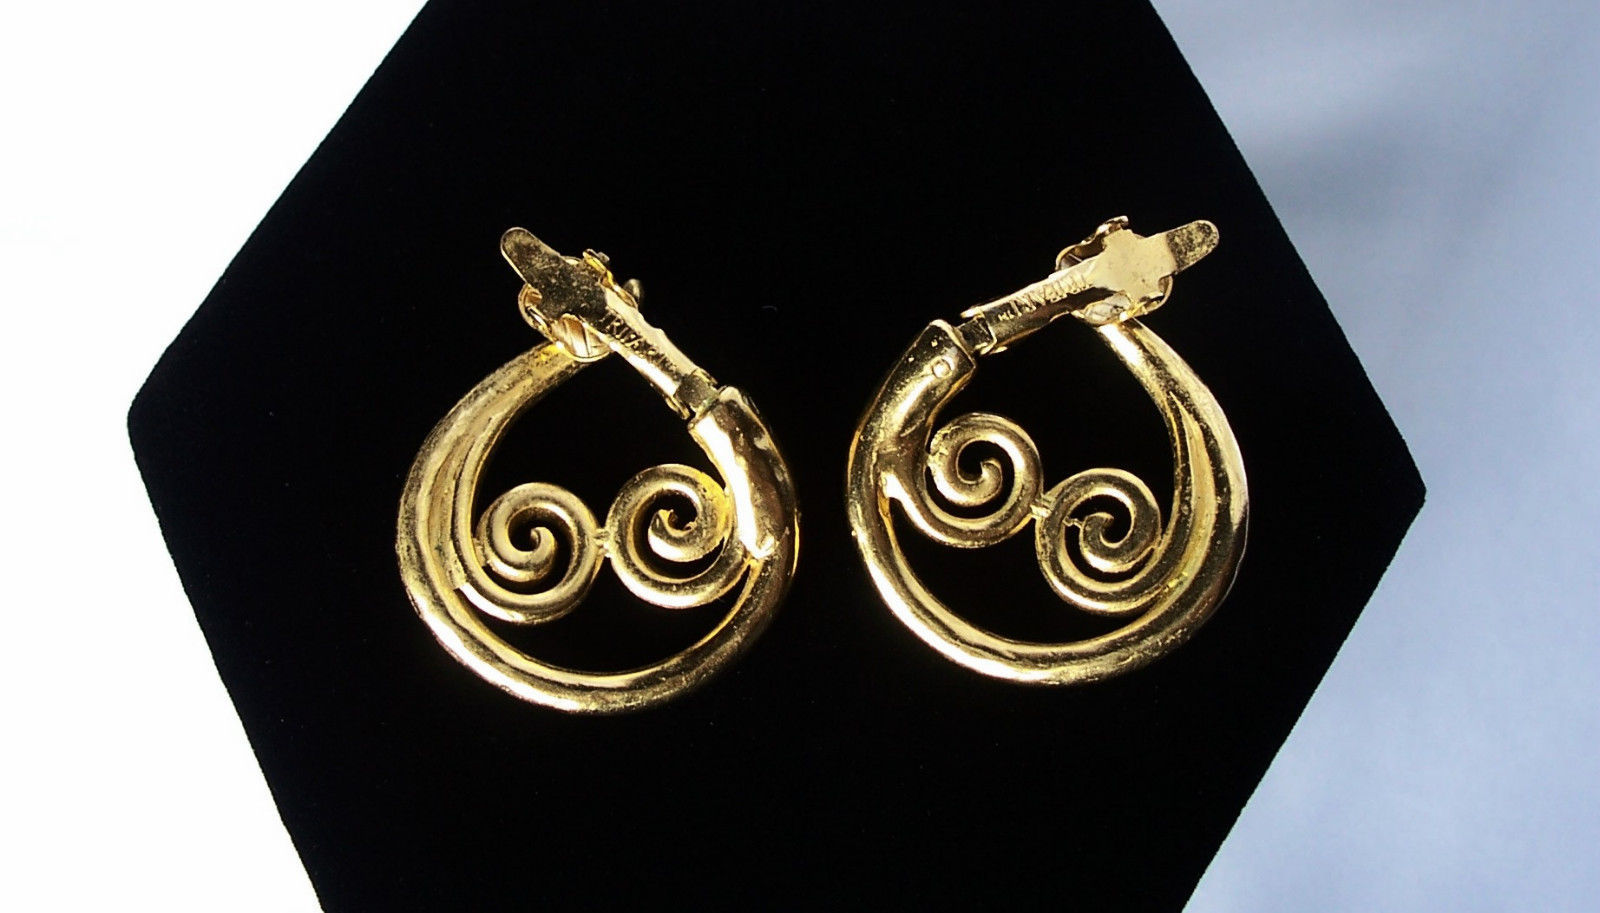 VintageTrifari Gold Plated Clip Earrings Swirling Hoop Design - Gorgeous!